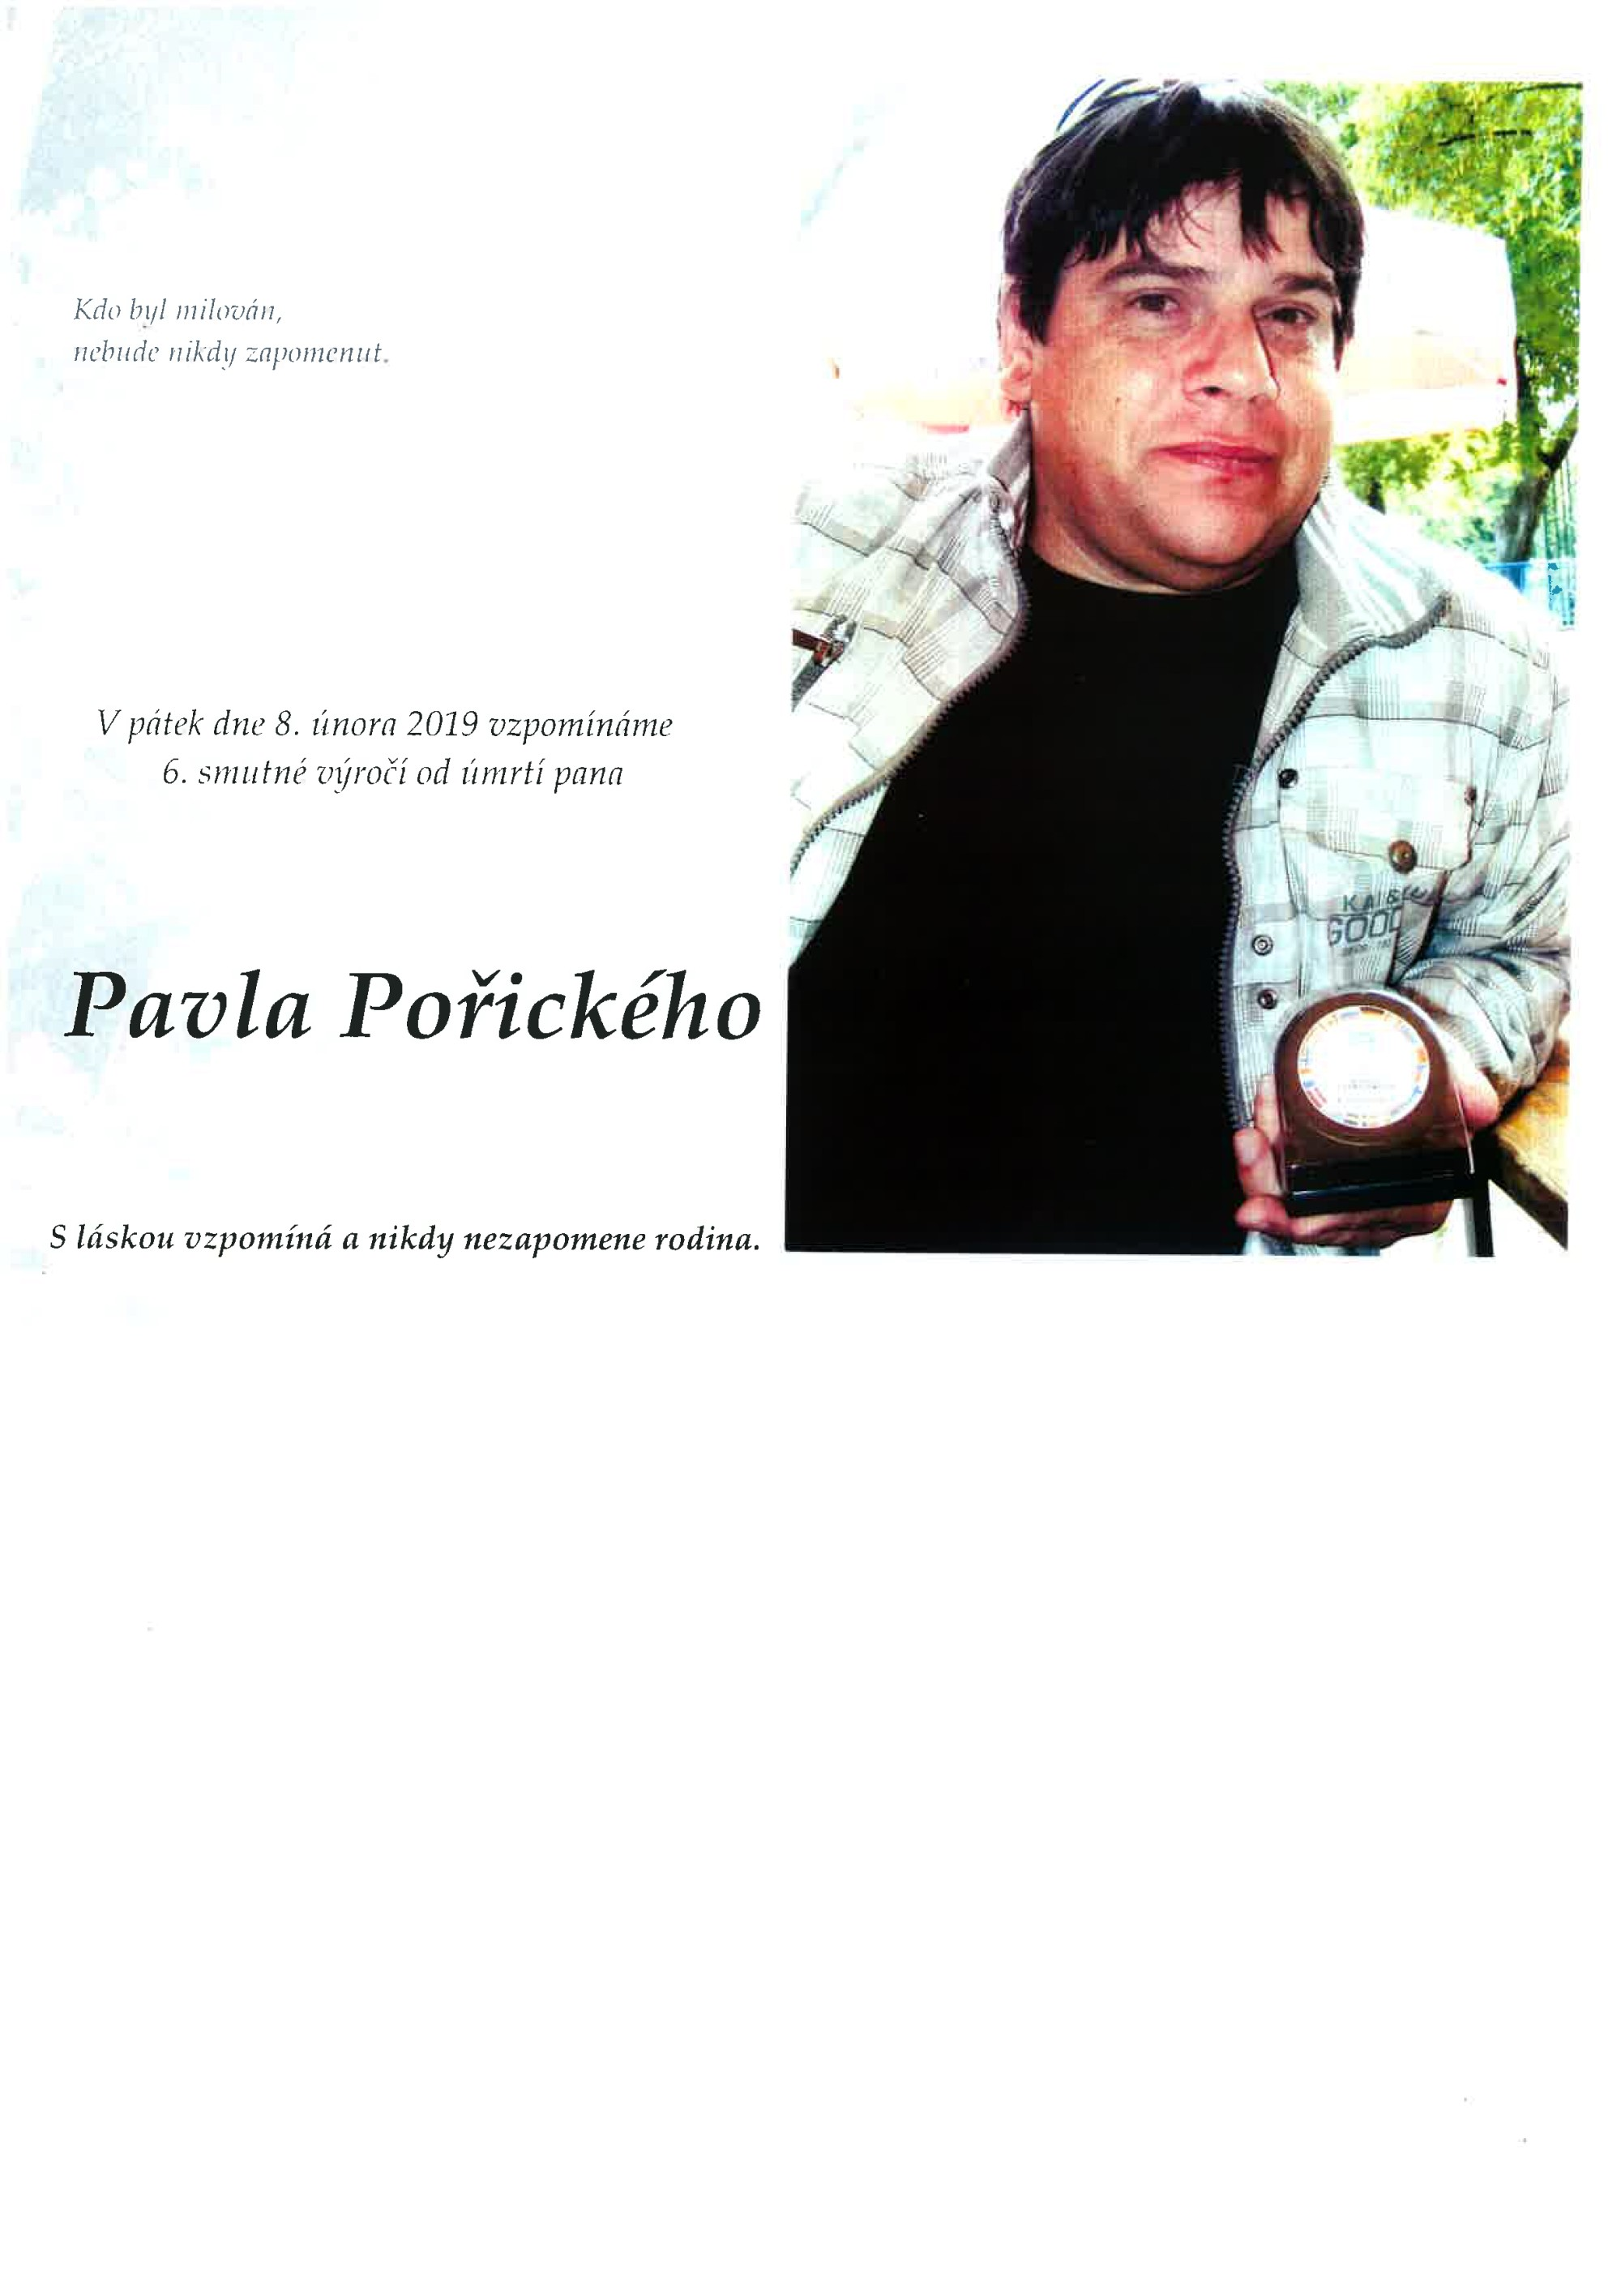 Pavel Pořický